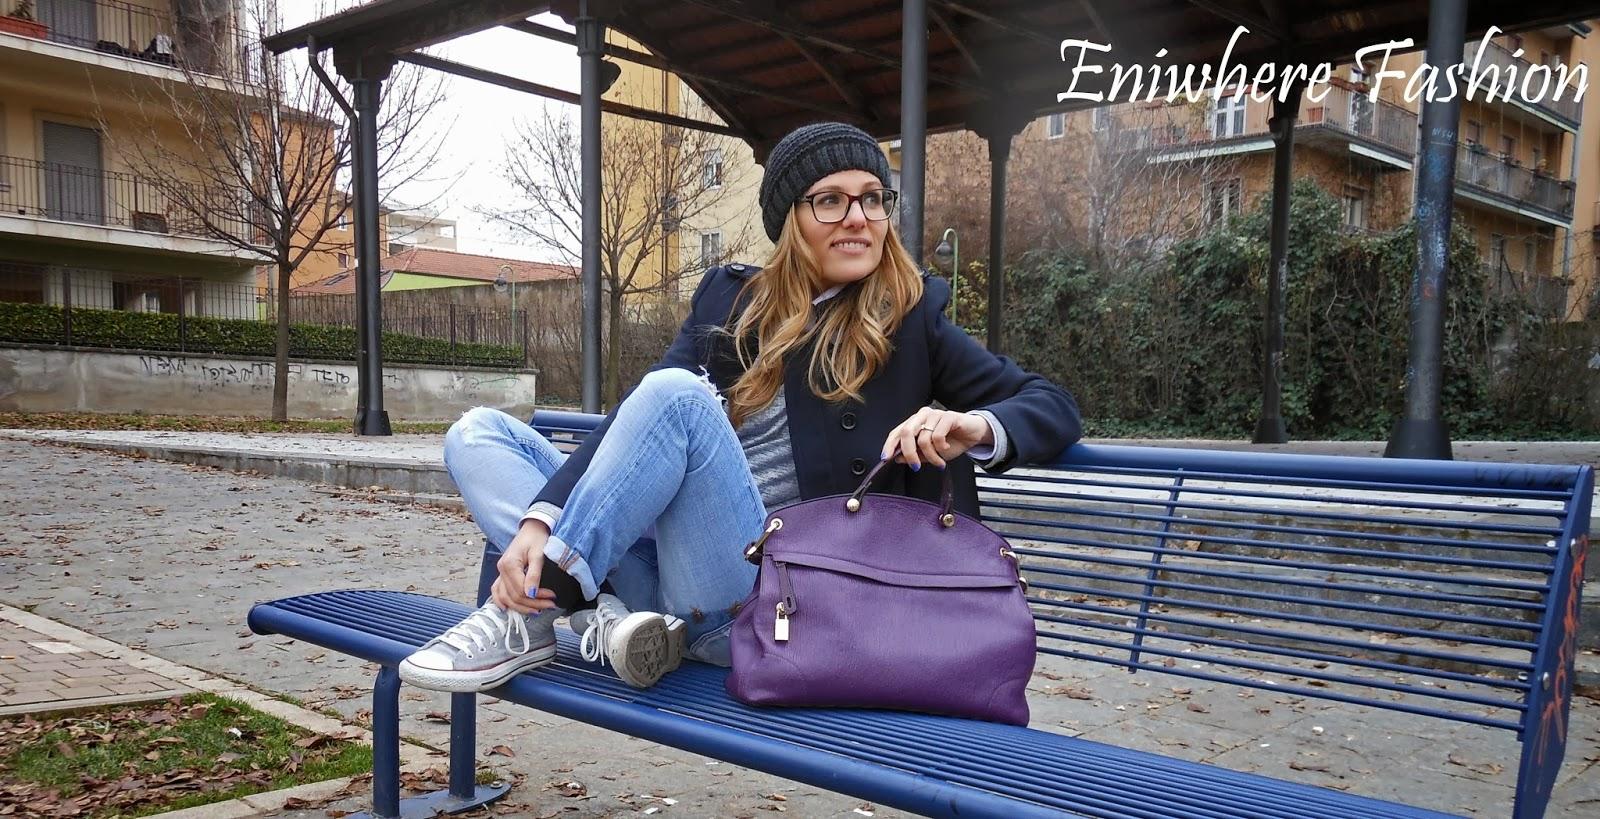 Eniwhere Fashion Boyfriend Look and Piper Furla